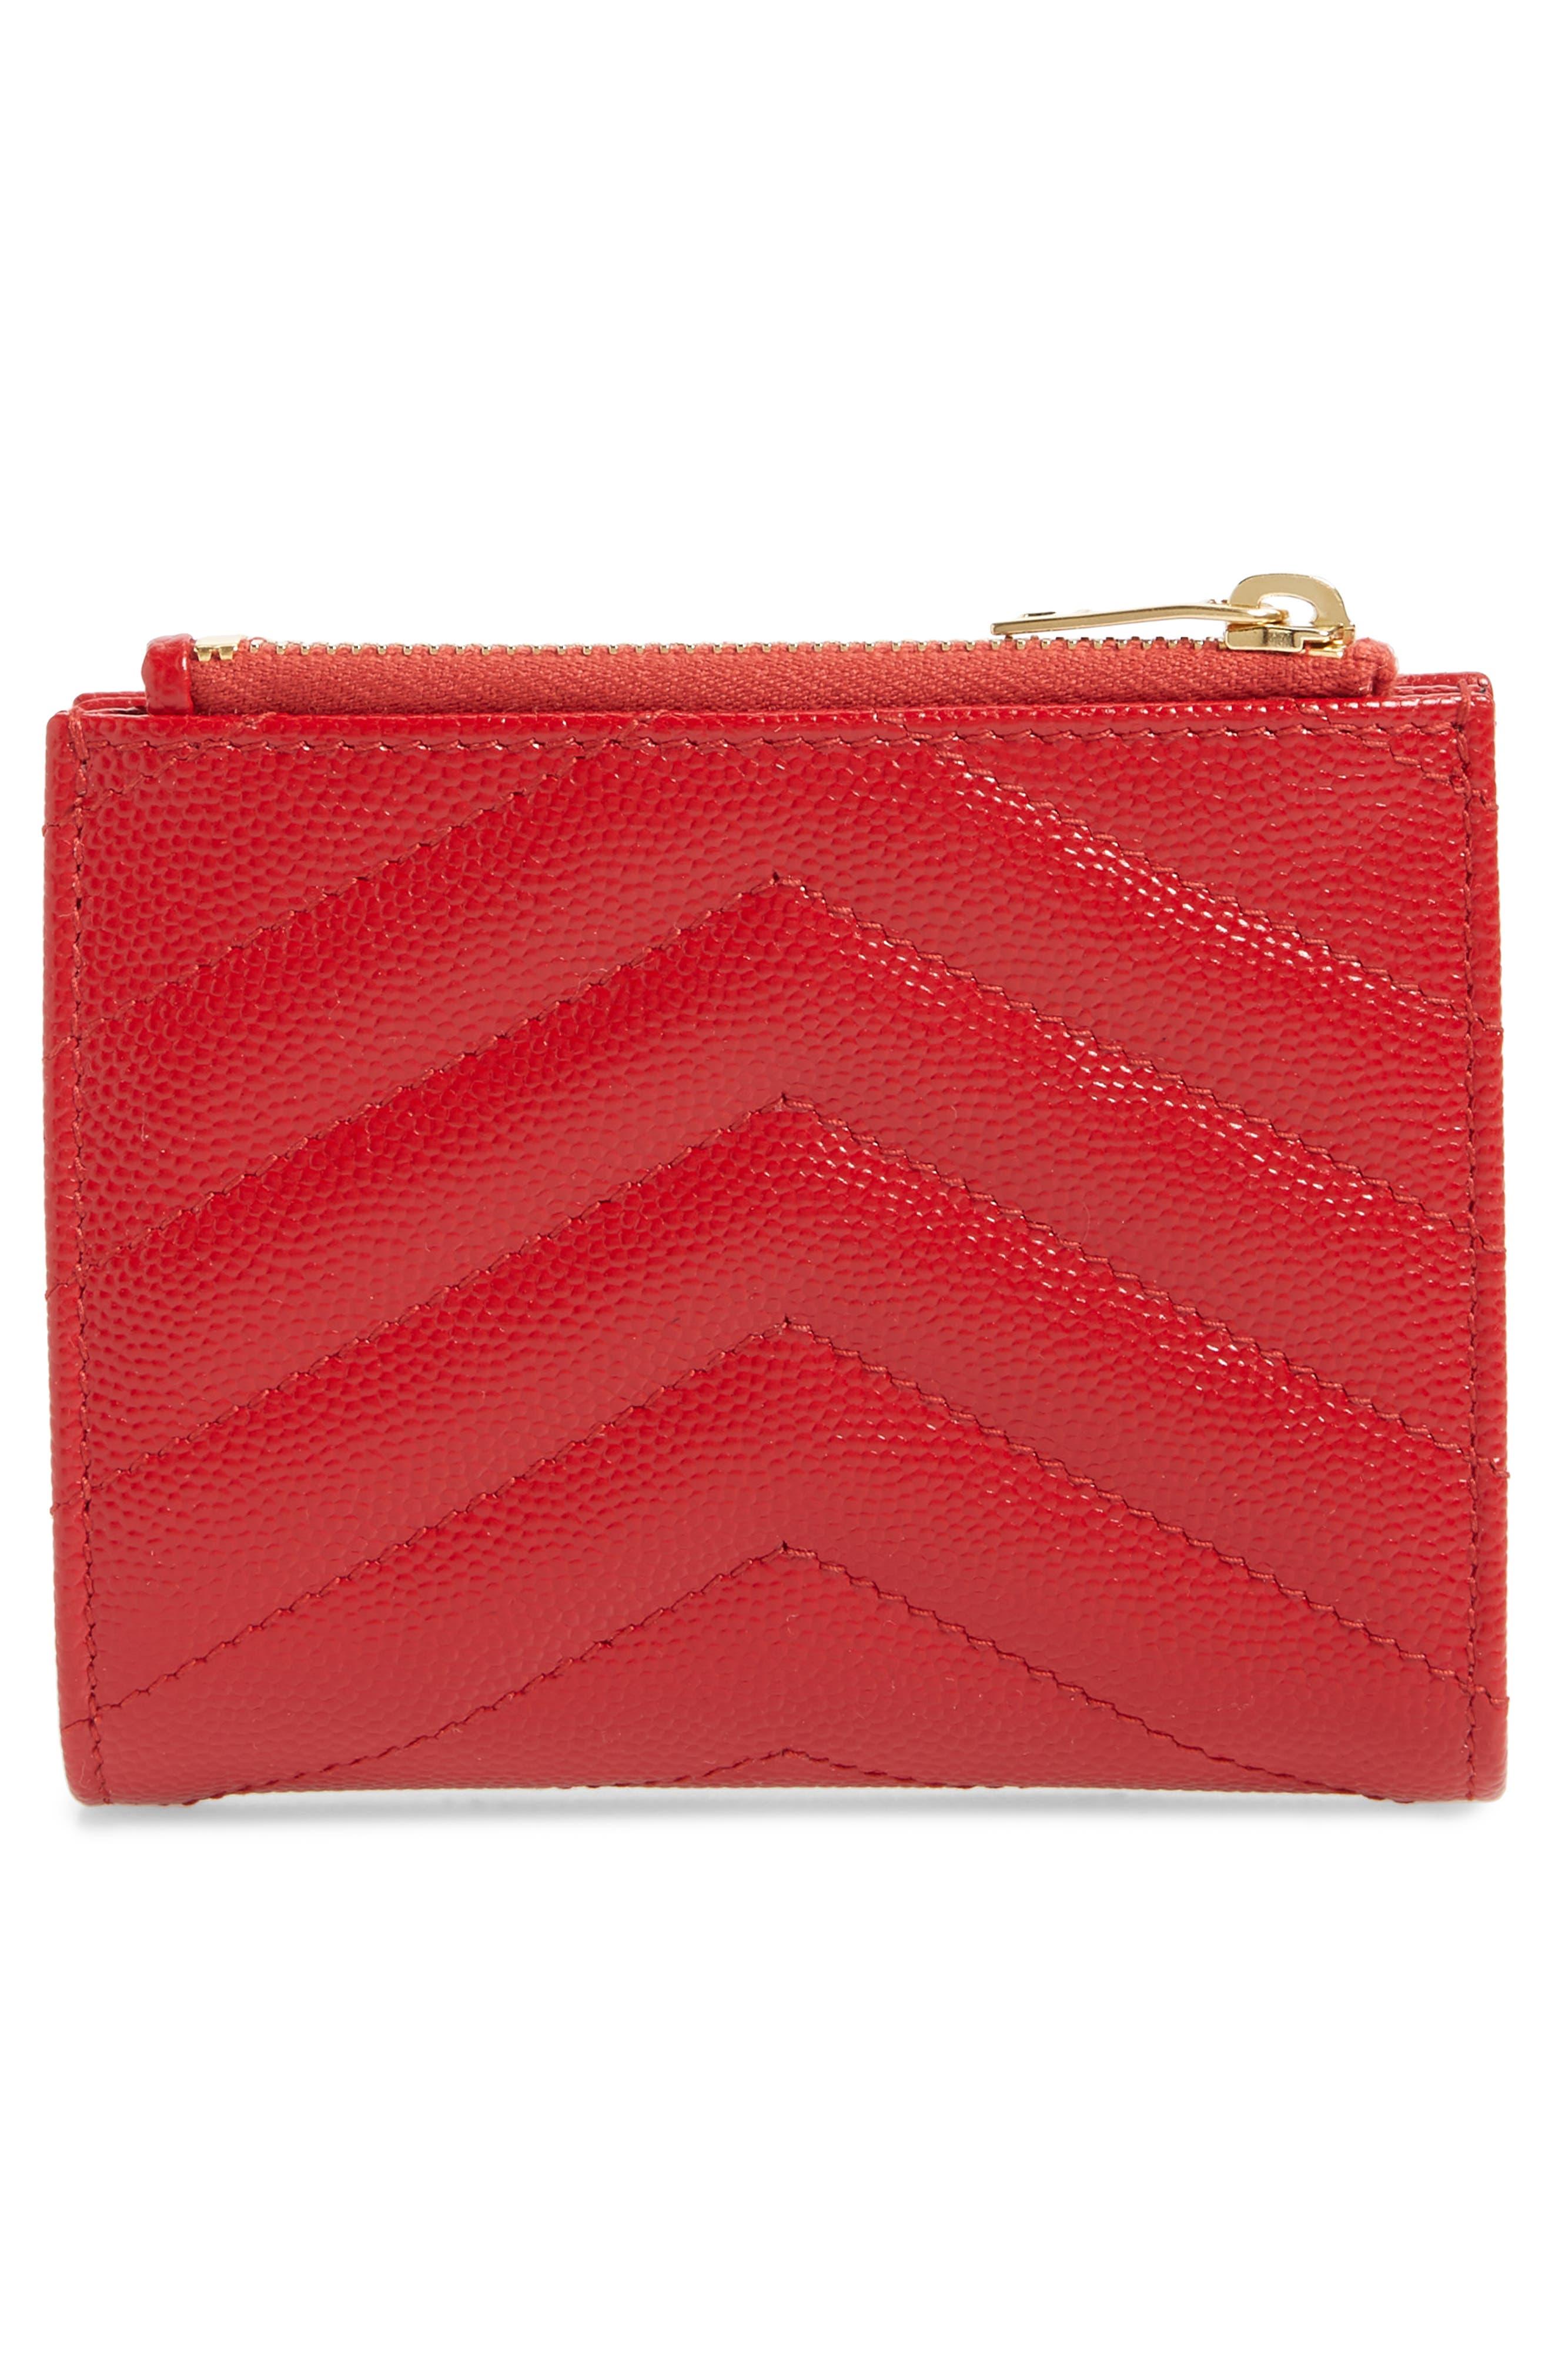 SAINT LAURENT, Monogram Leather Card Case, Alternate thumbnail 4, color, BANDANA RED